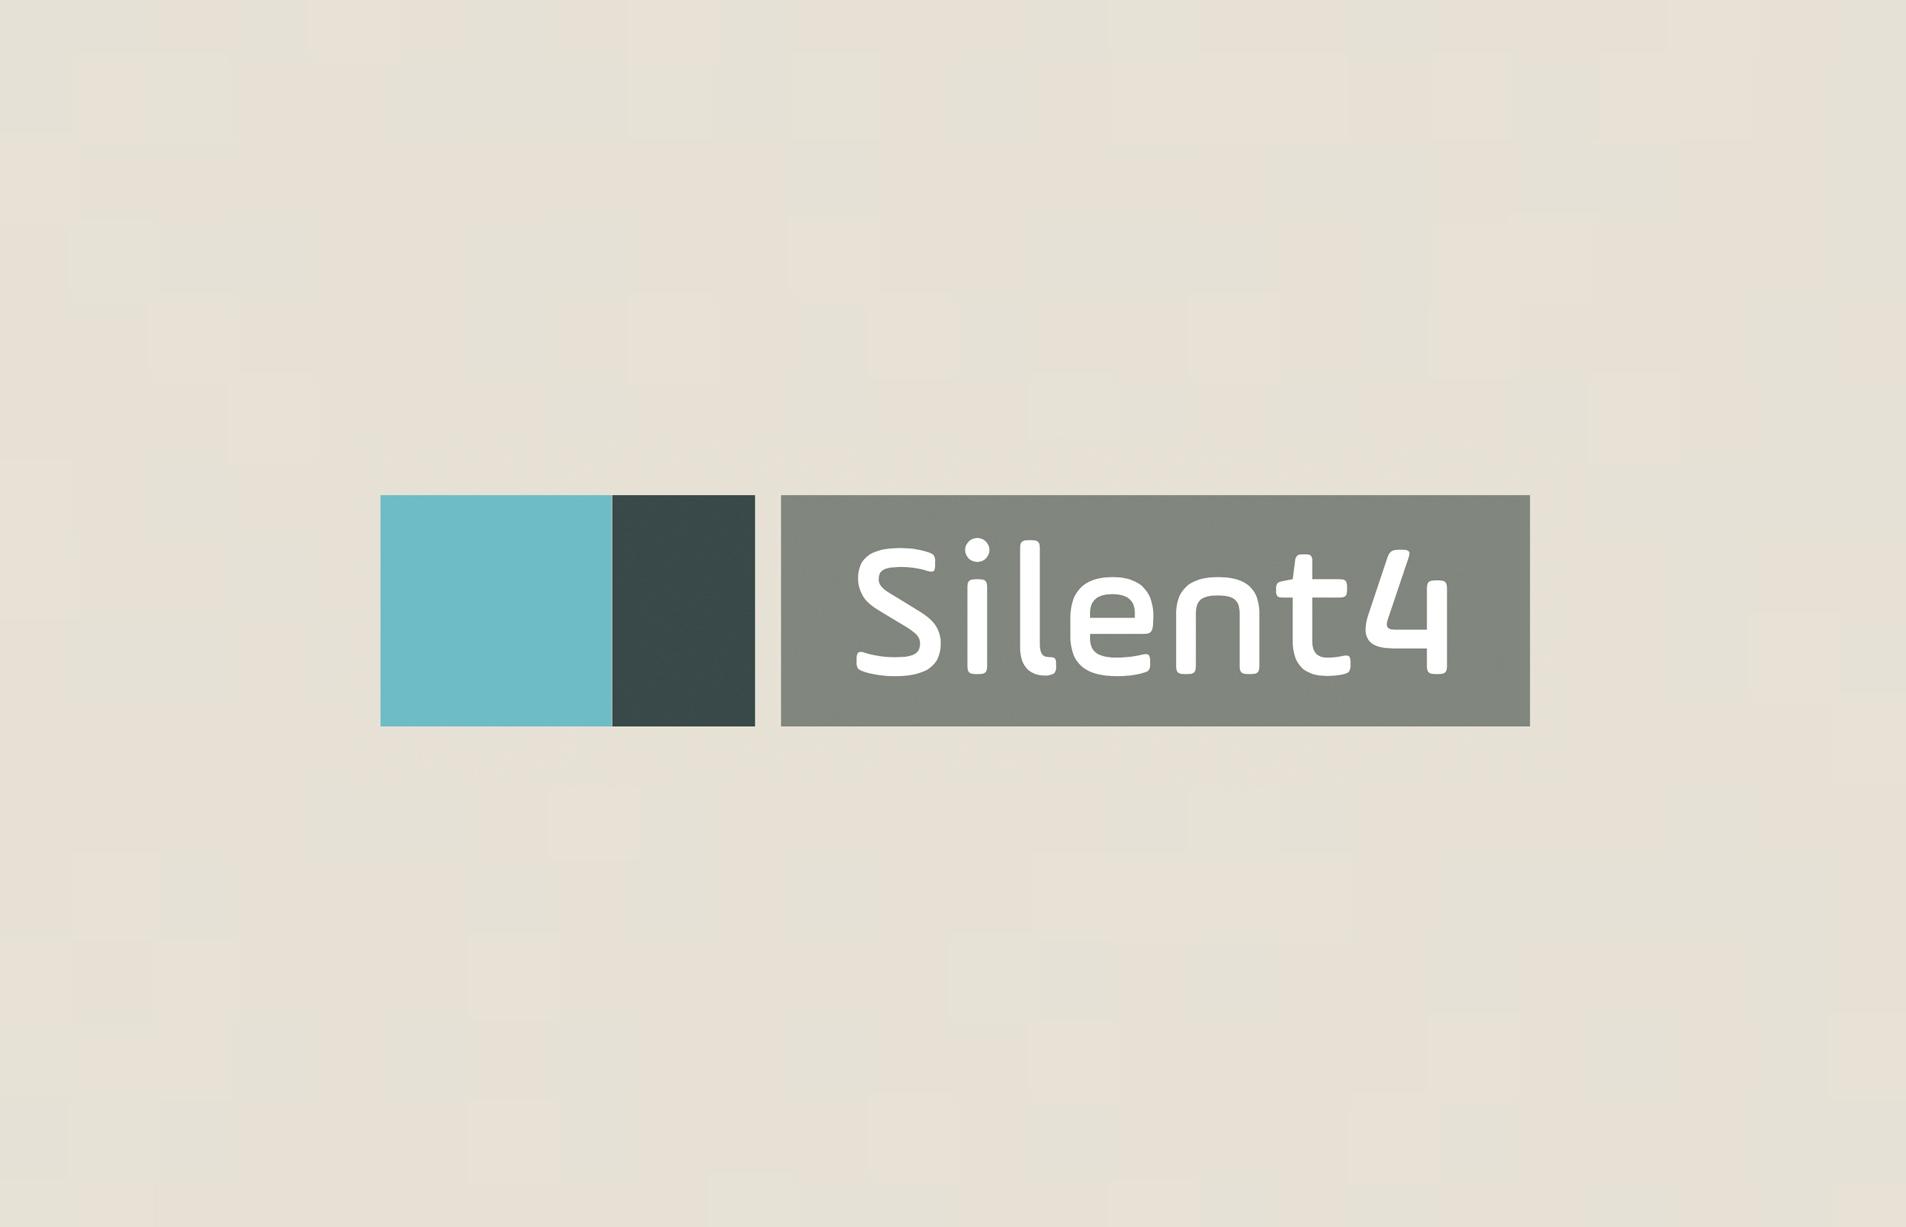 Silent4